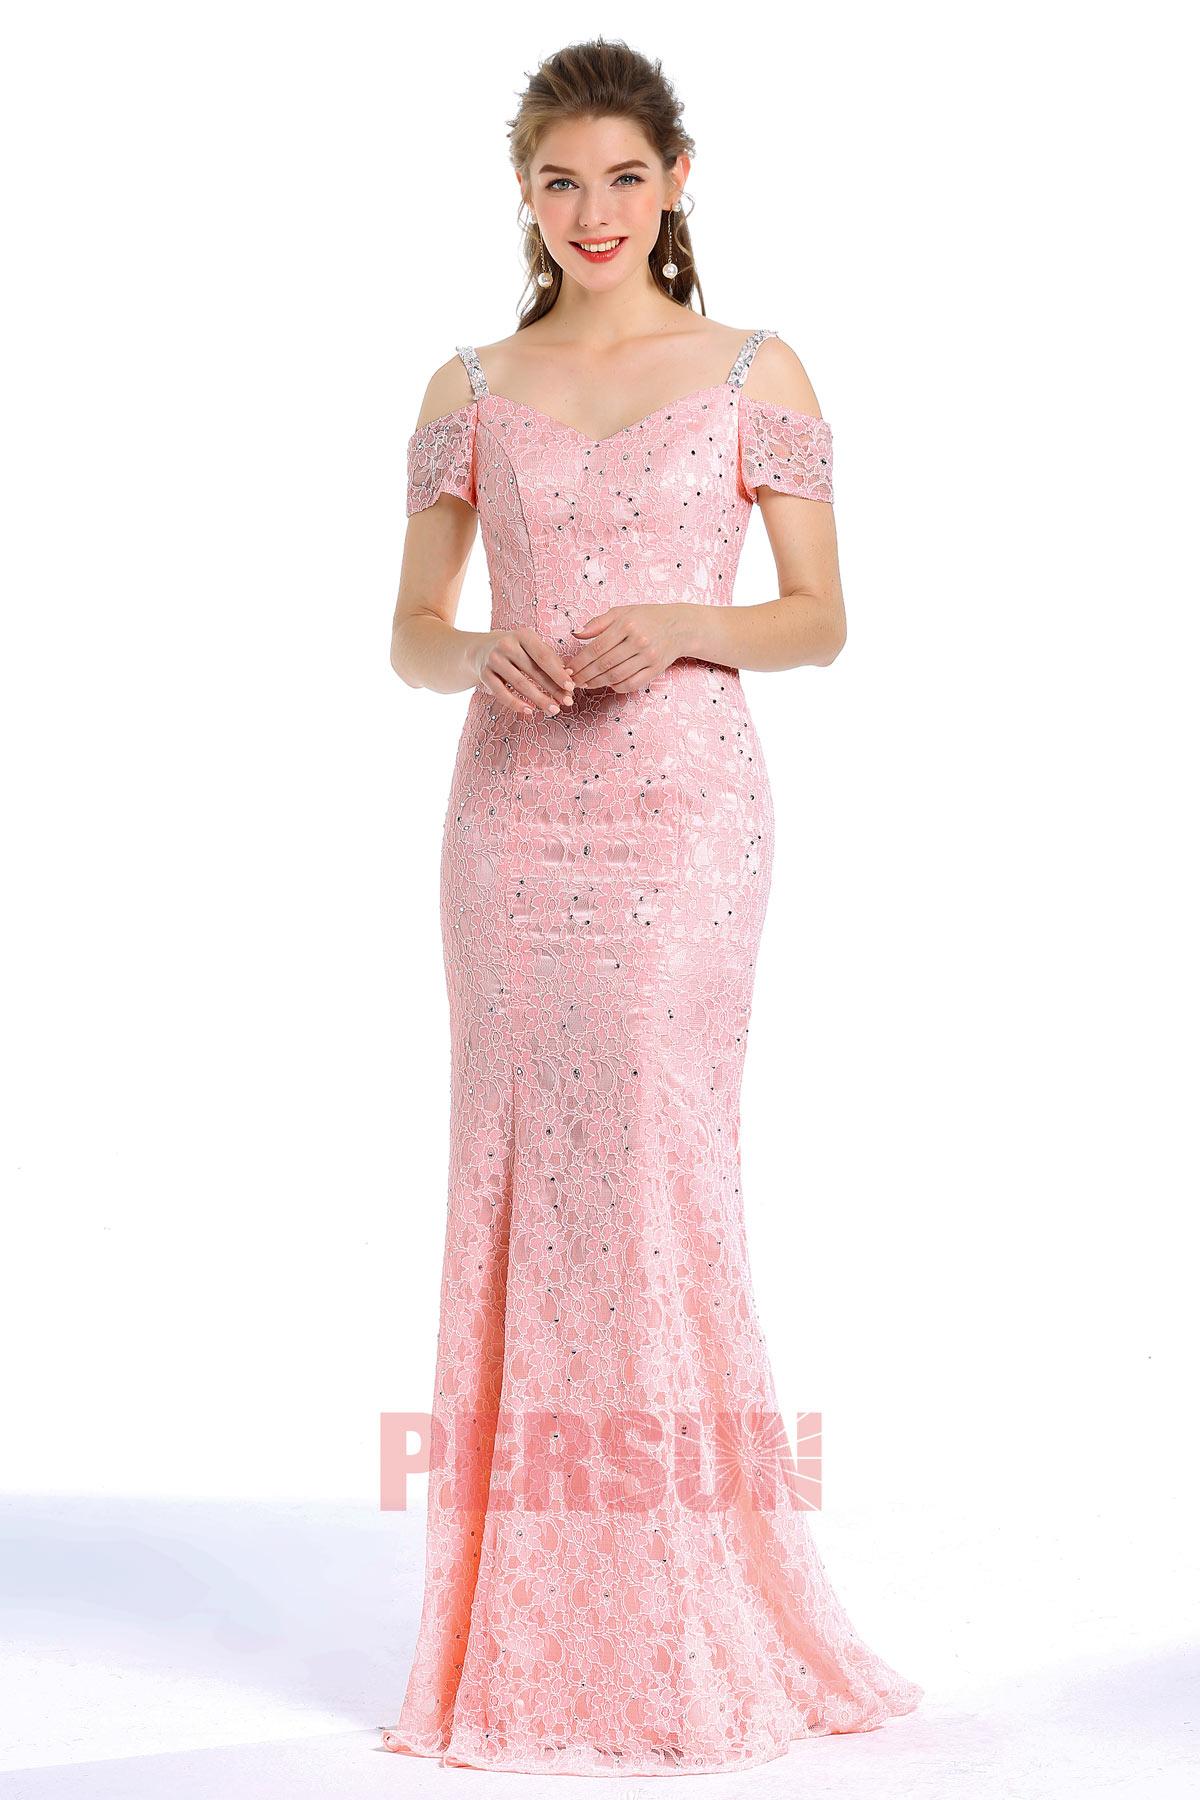 lang Meerjungfrau-Stil rosa 1/4 Ärmel Paillette spitze Brautjungfernkleid